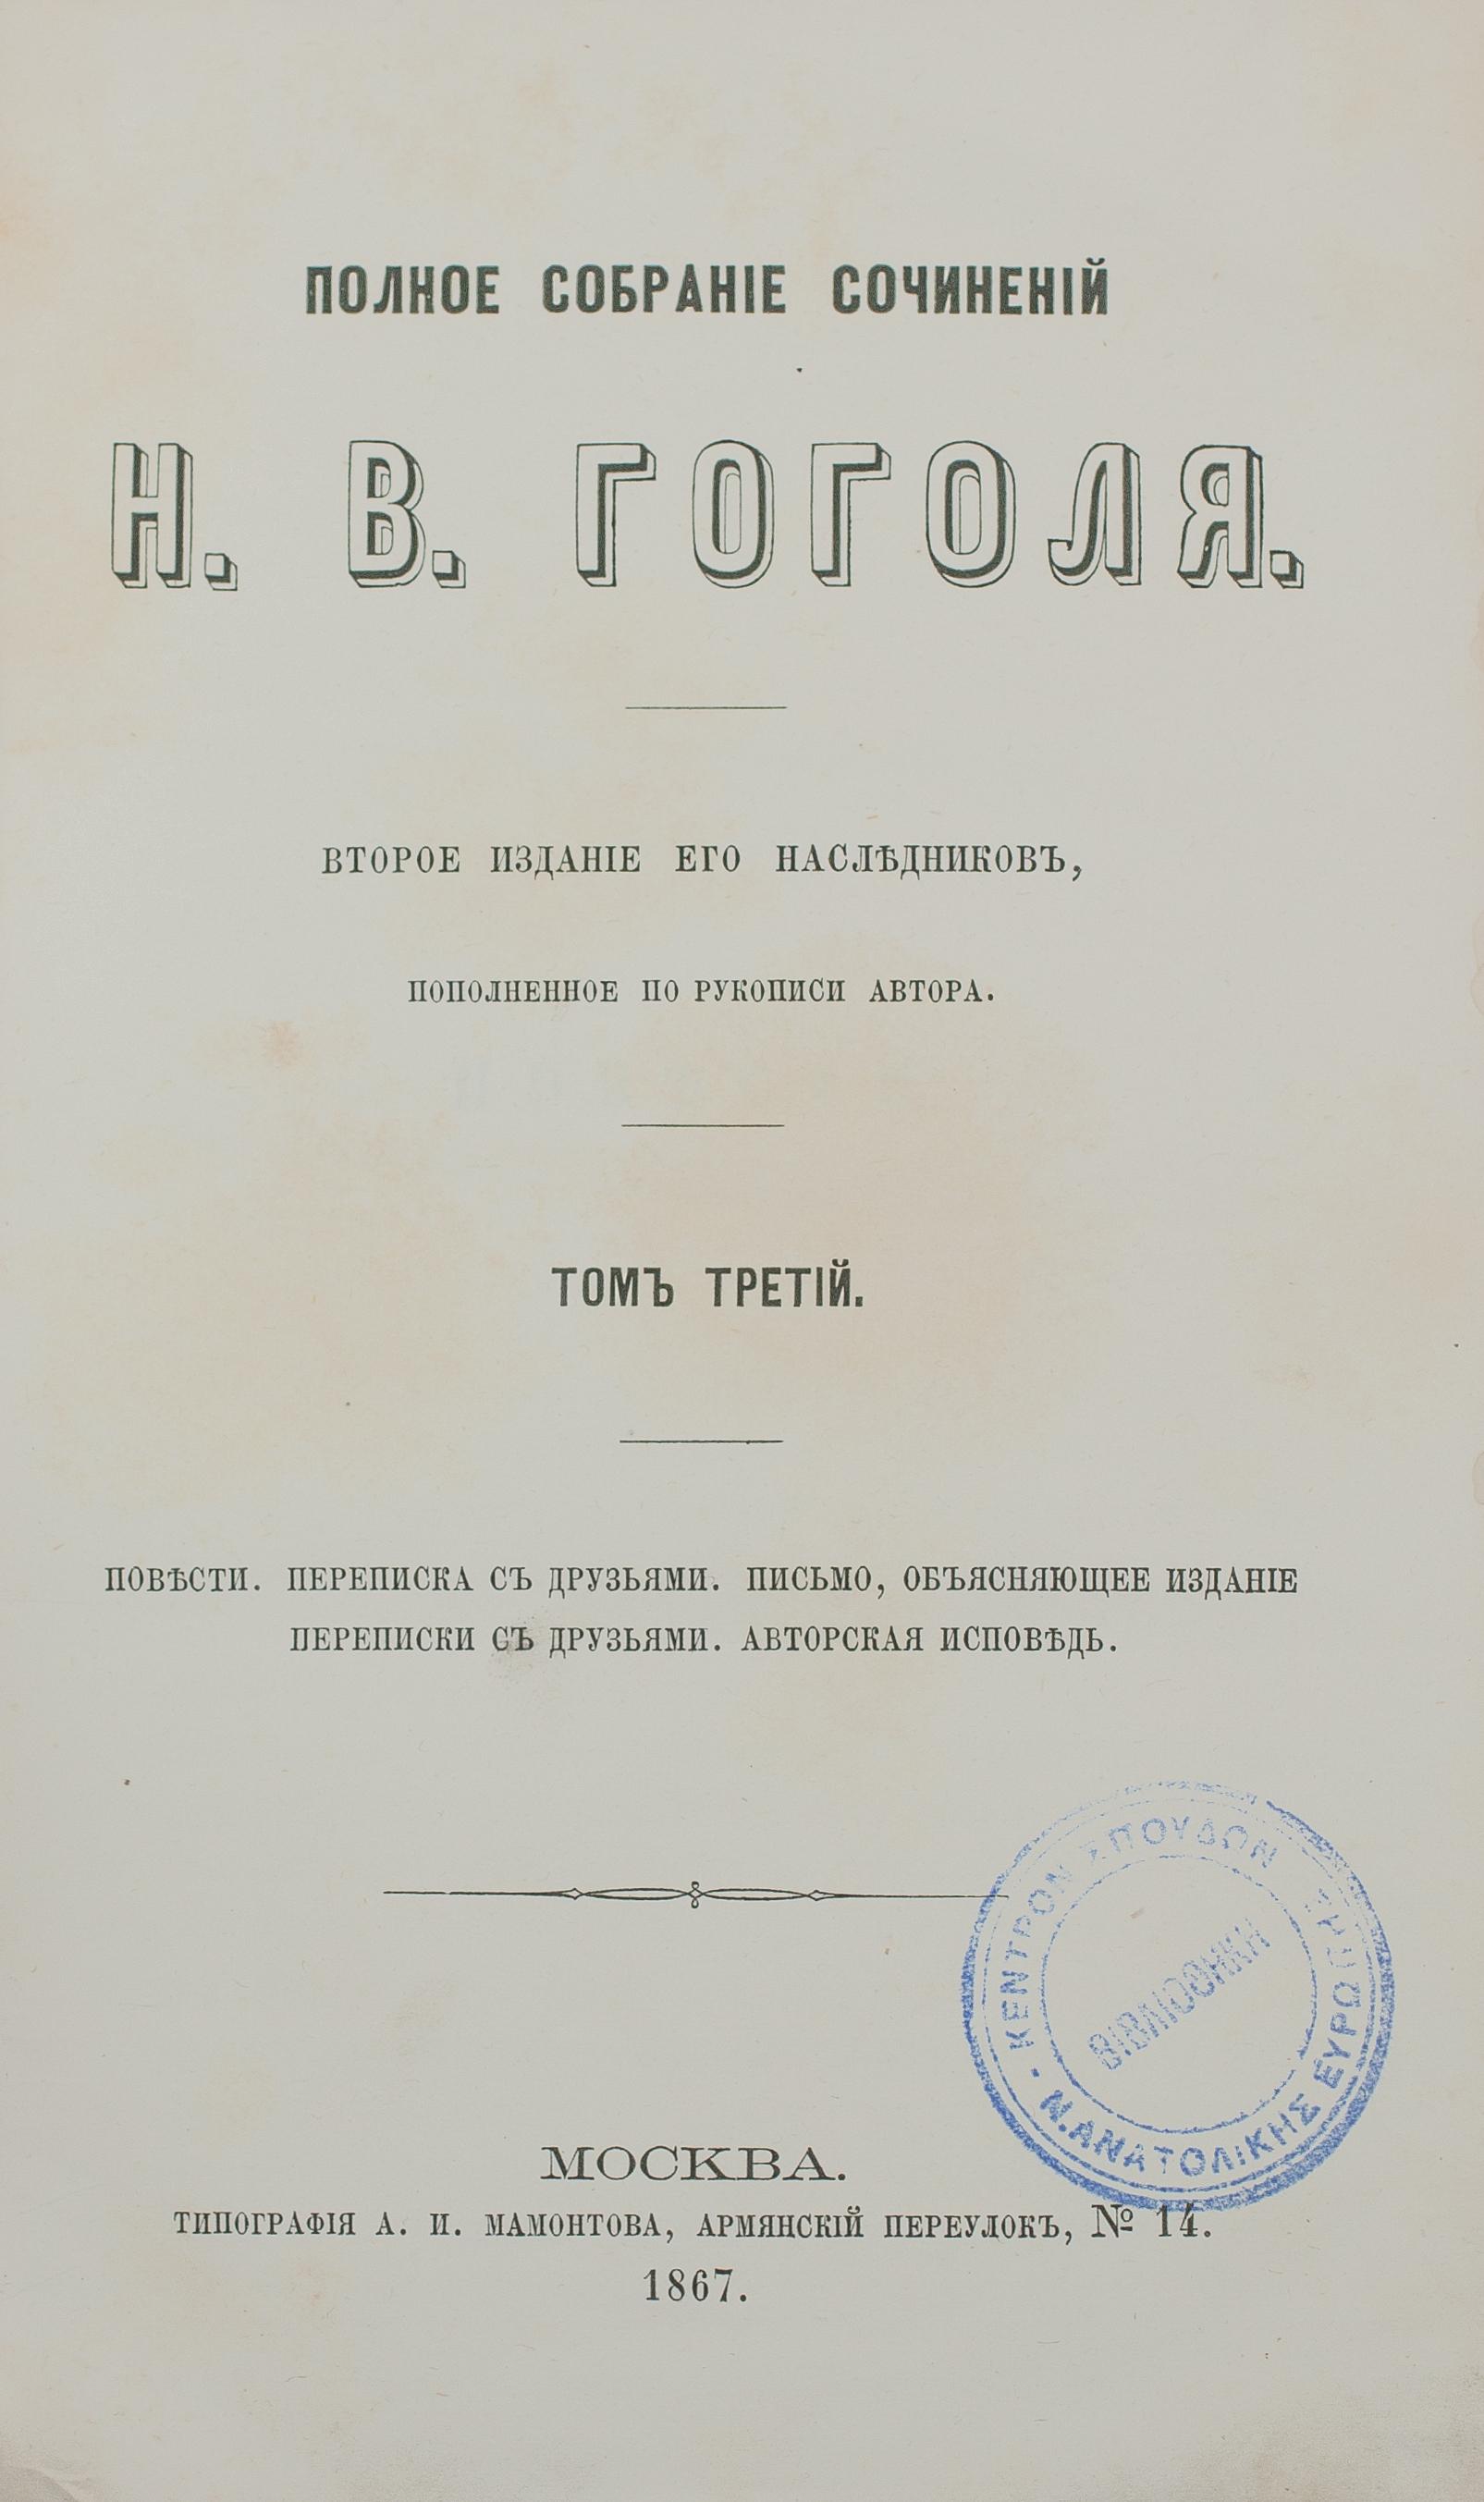 Lot 406 - GOGOL, Nicolas. Œuvres complètes. Moscou, imp. A. Mamontov, 1867. 1 vol. in-8°. [...]